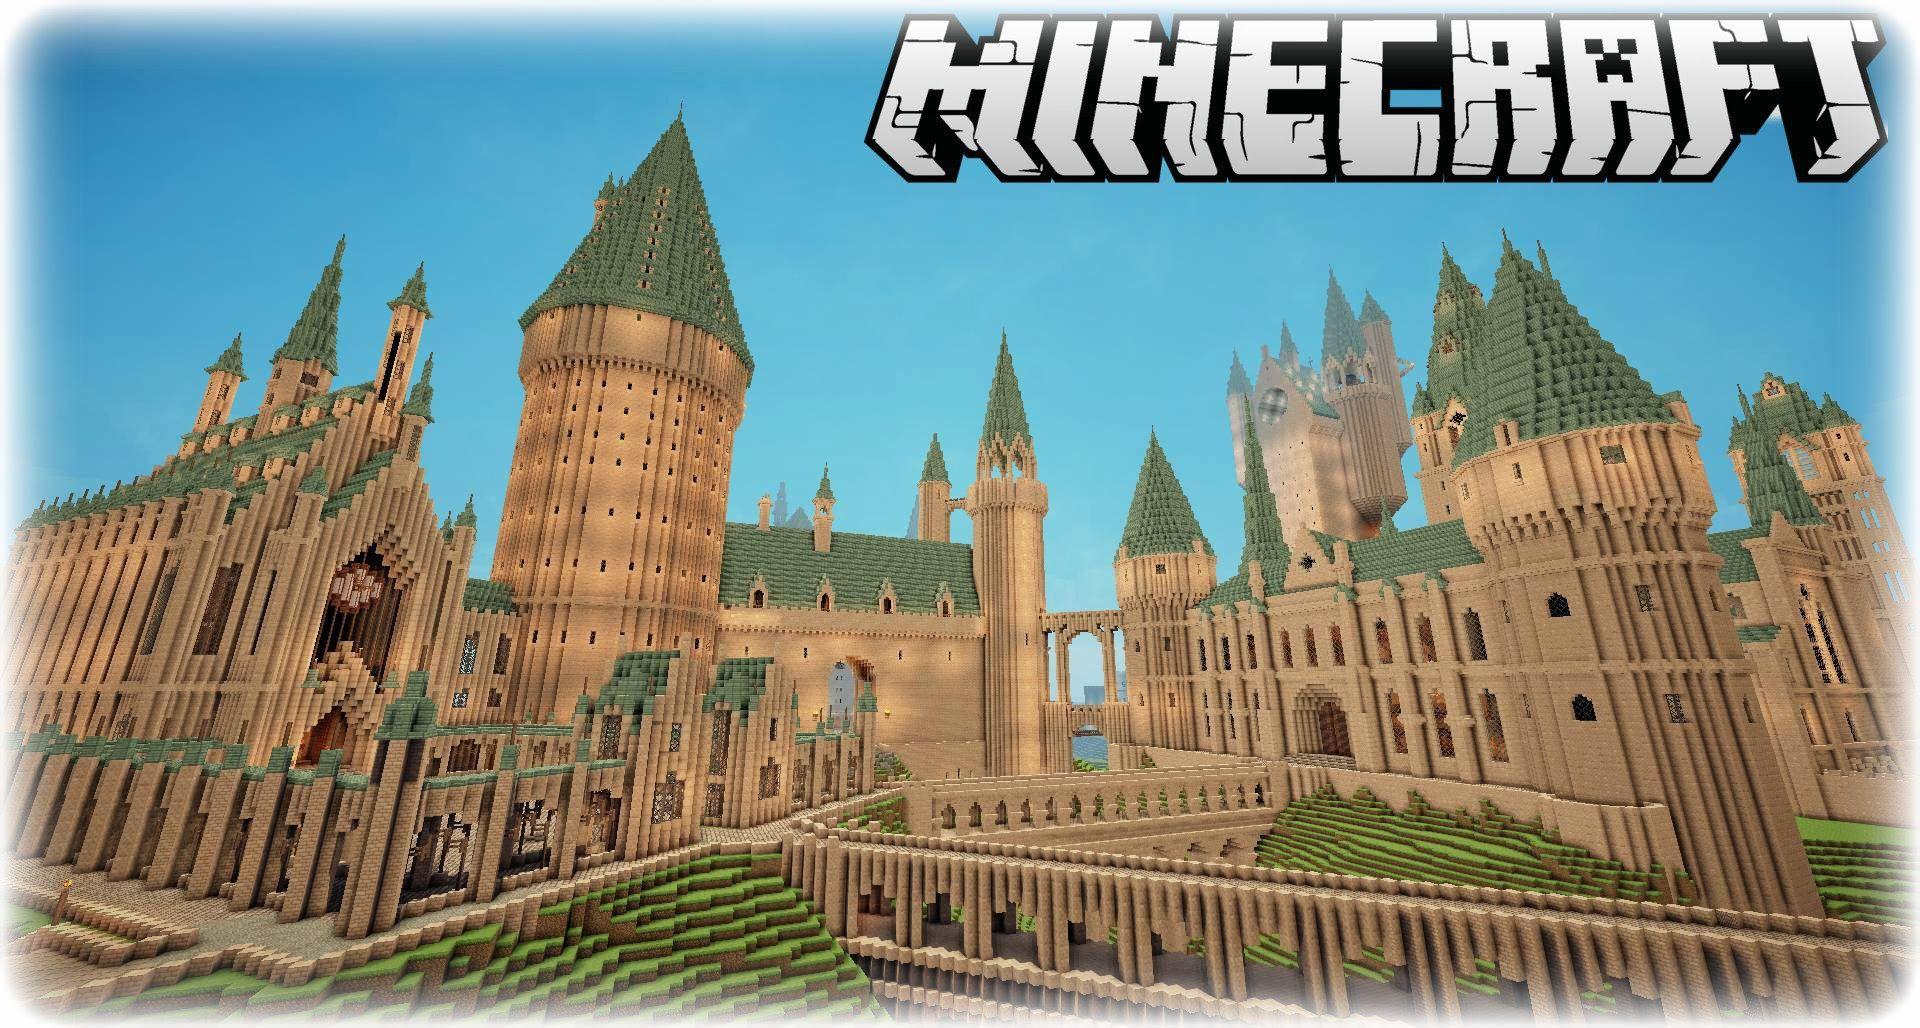 Remarkable Minecraft Hogwarts Harry Potter Replica Adventure Map 1 7 10 Hogwarts Minecraft Hogwarts Adventure Map